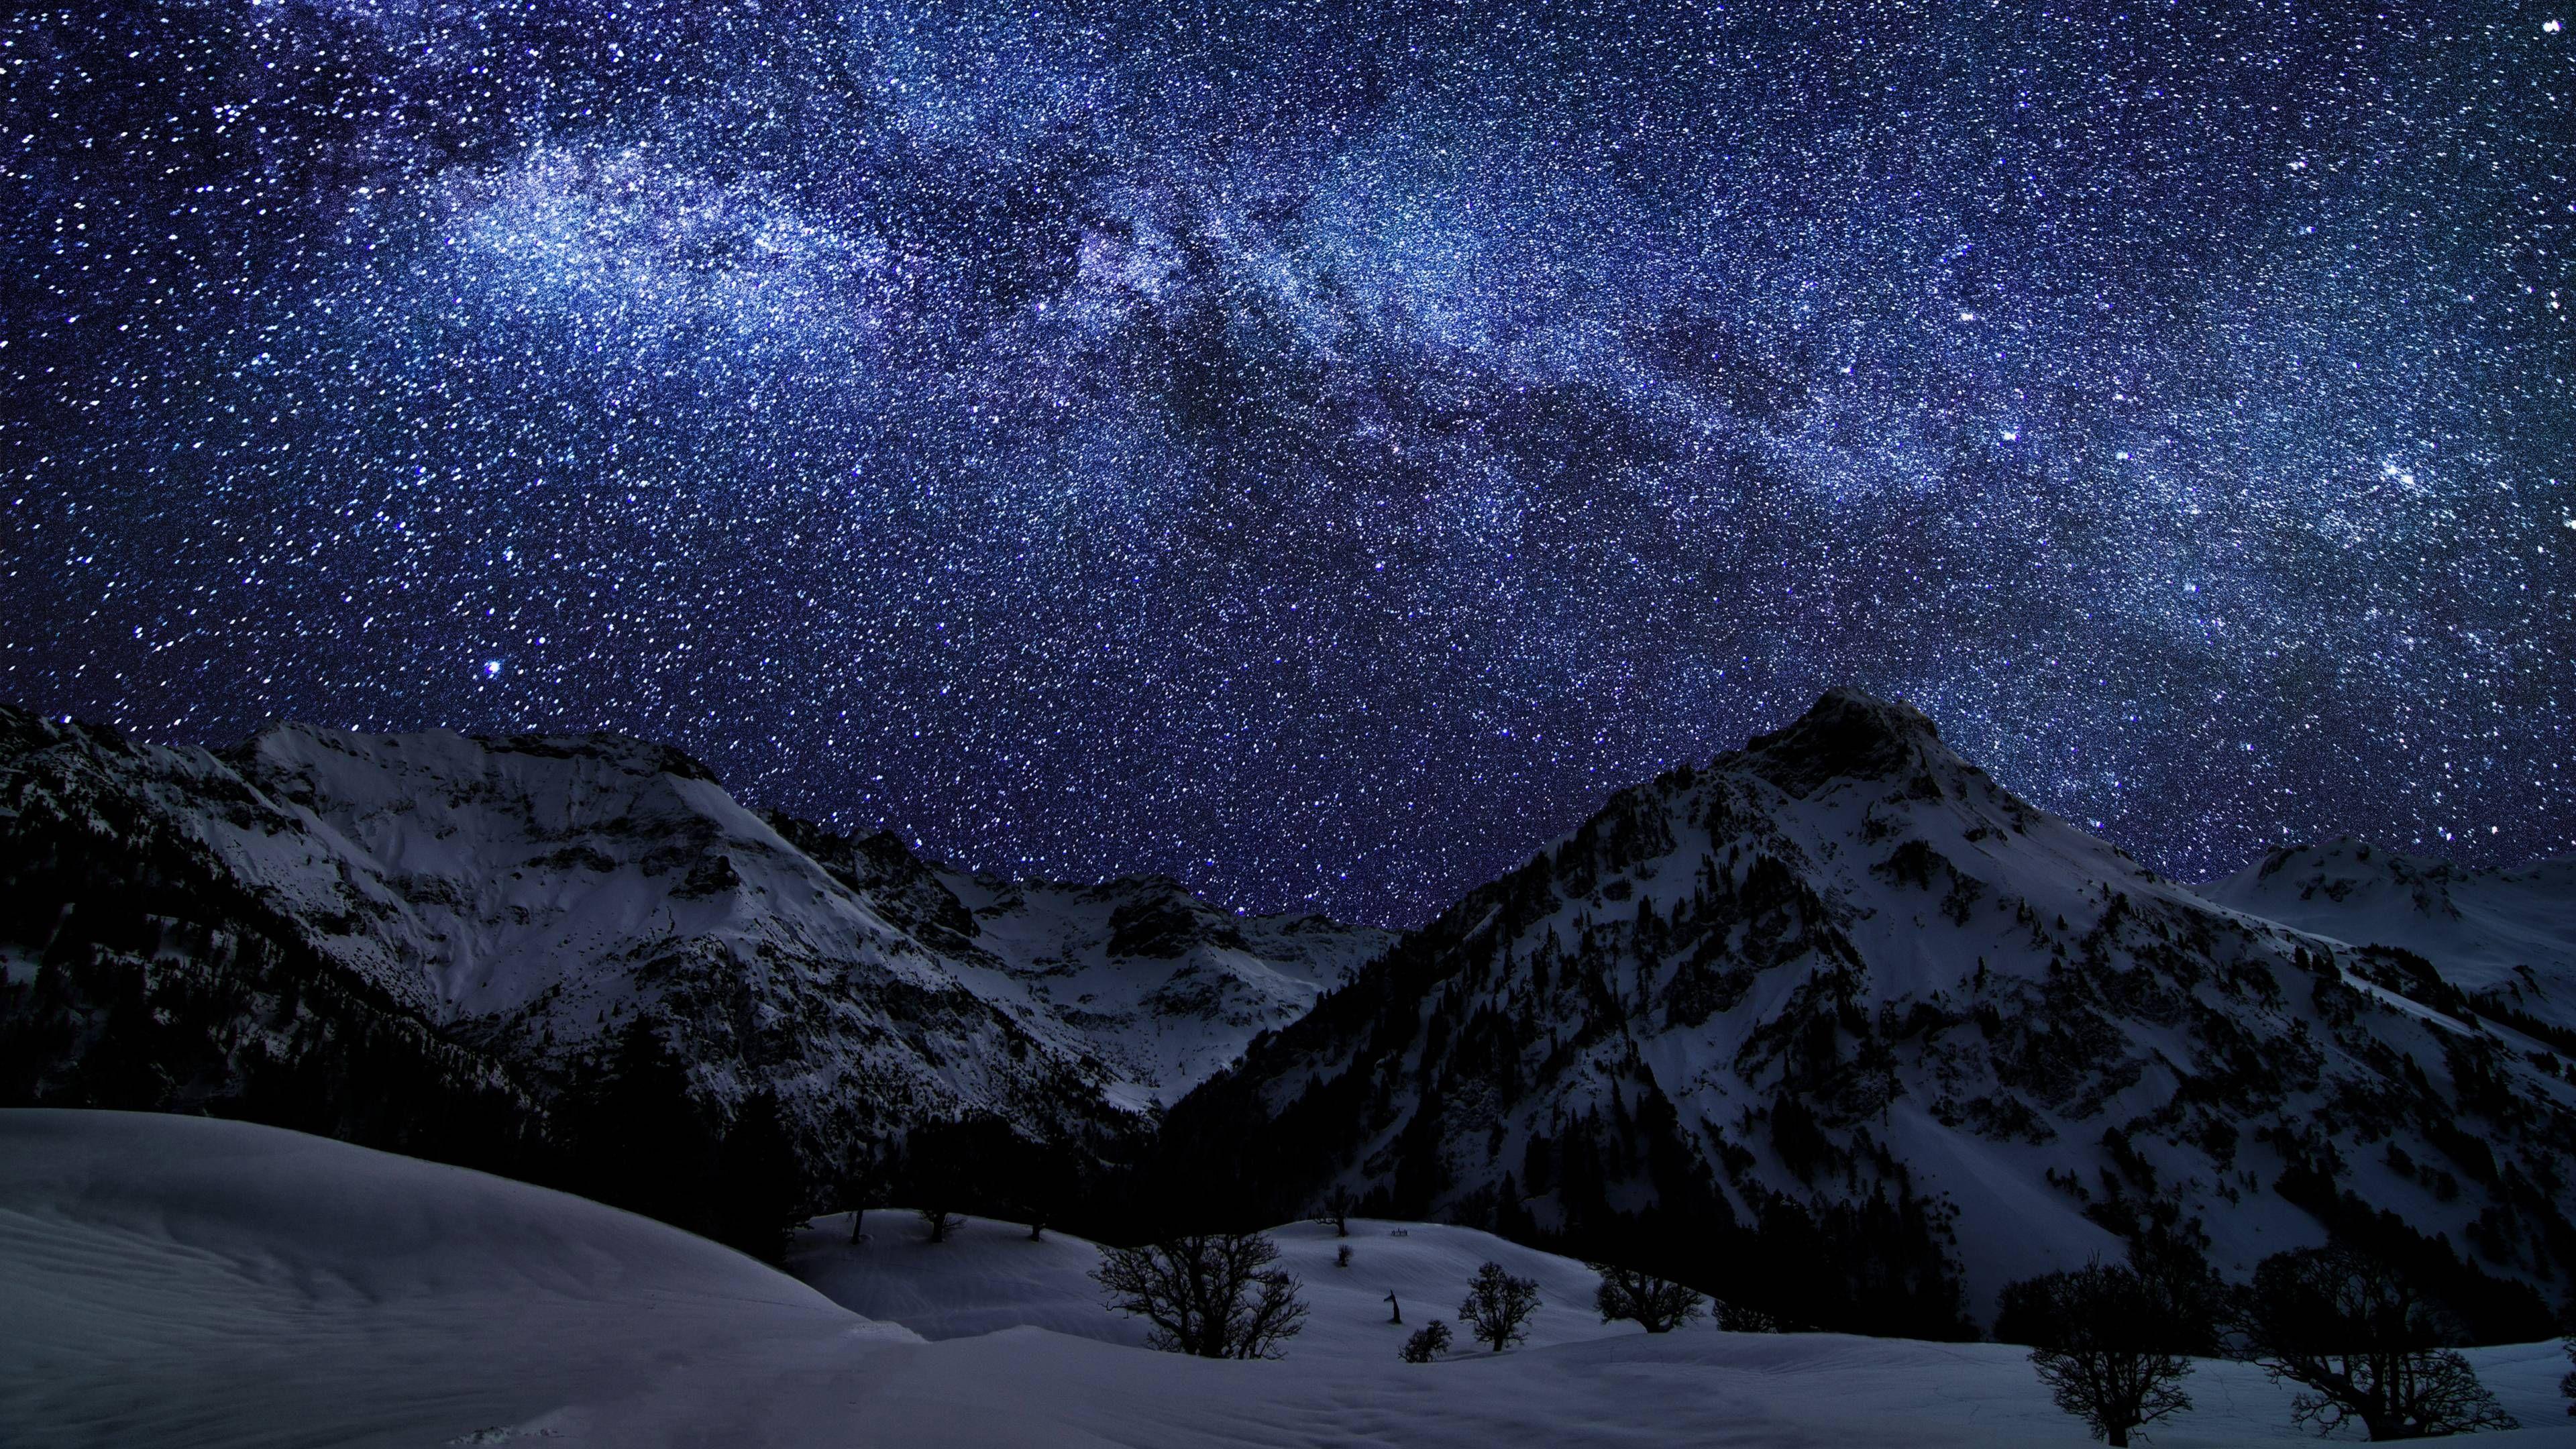 4k Wallpaper Dump Night Skies Winter Sky Sky